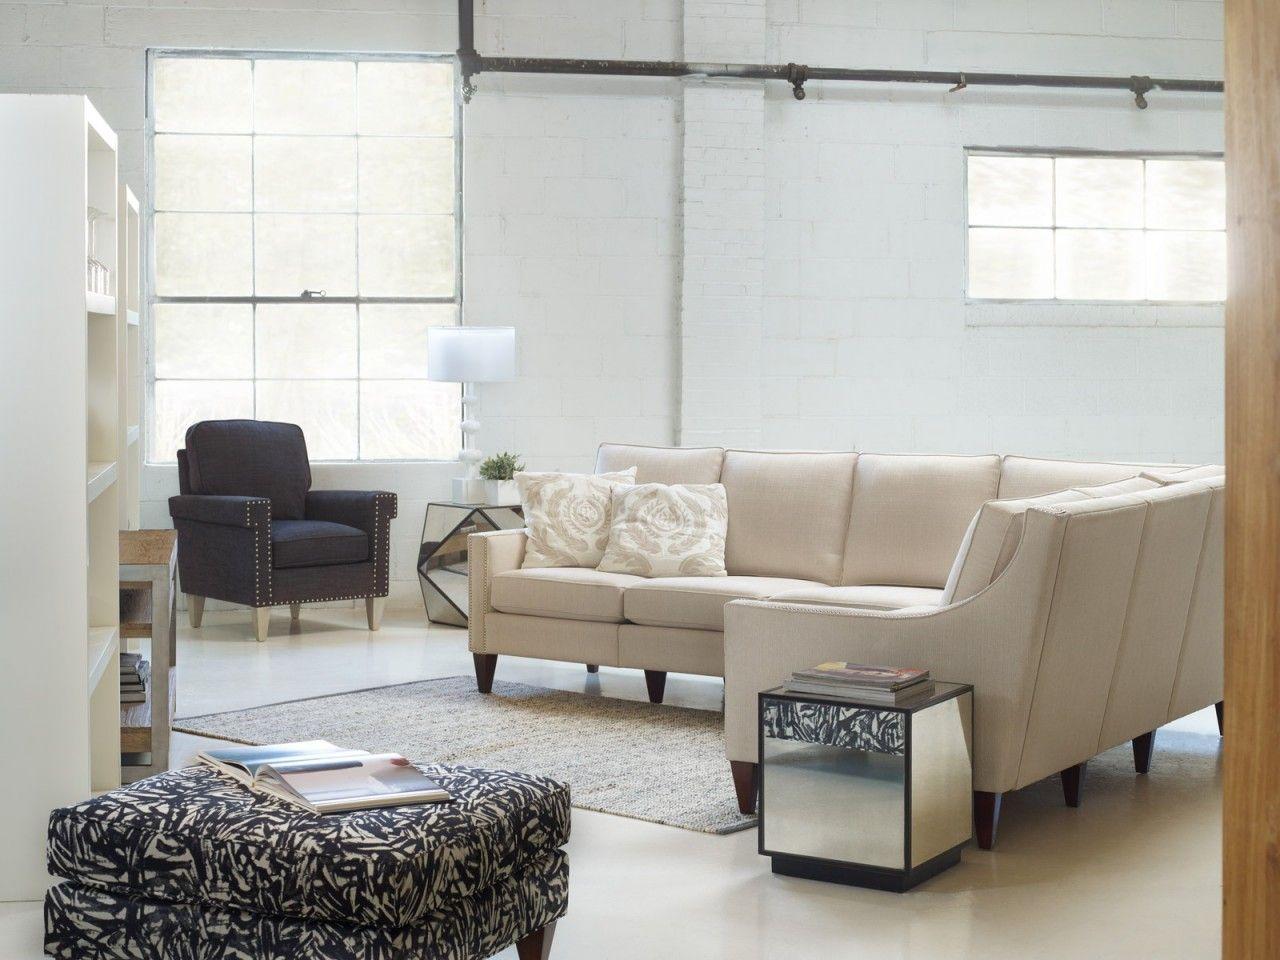 Room · Homeware Peyton Sectional Living Room Set In Cream